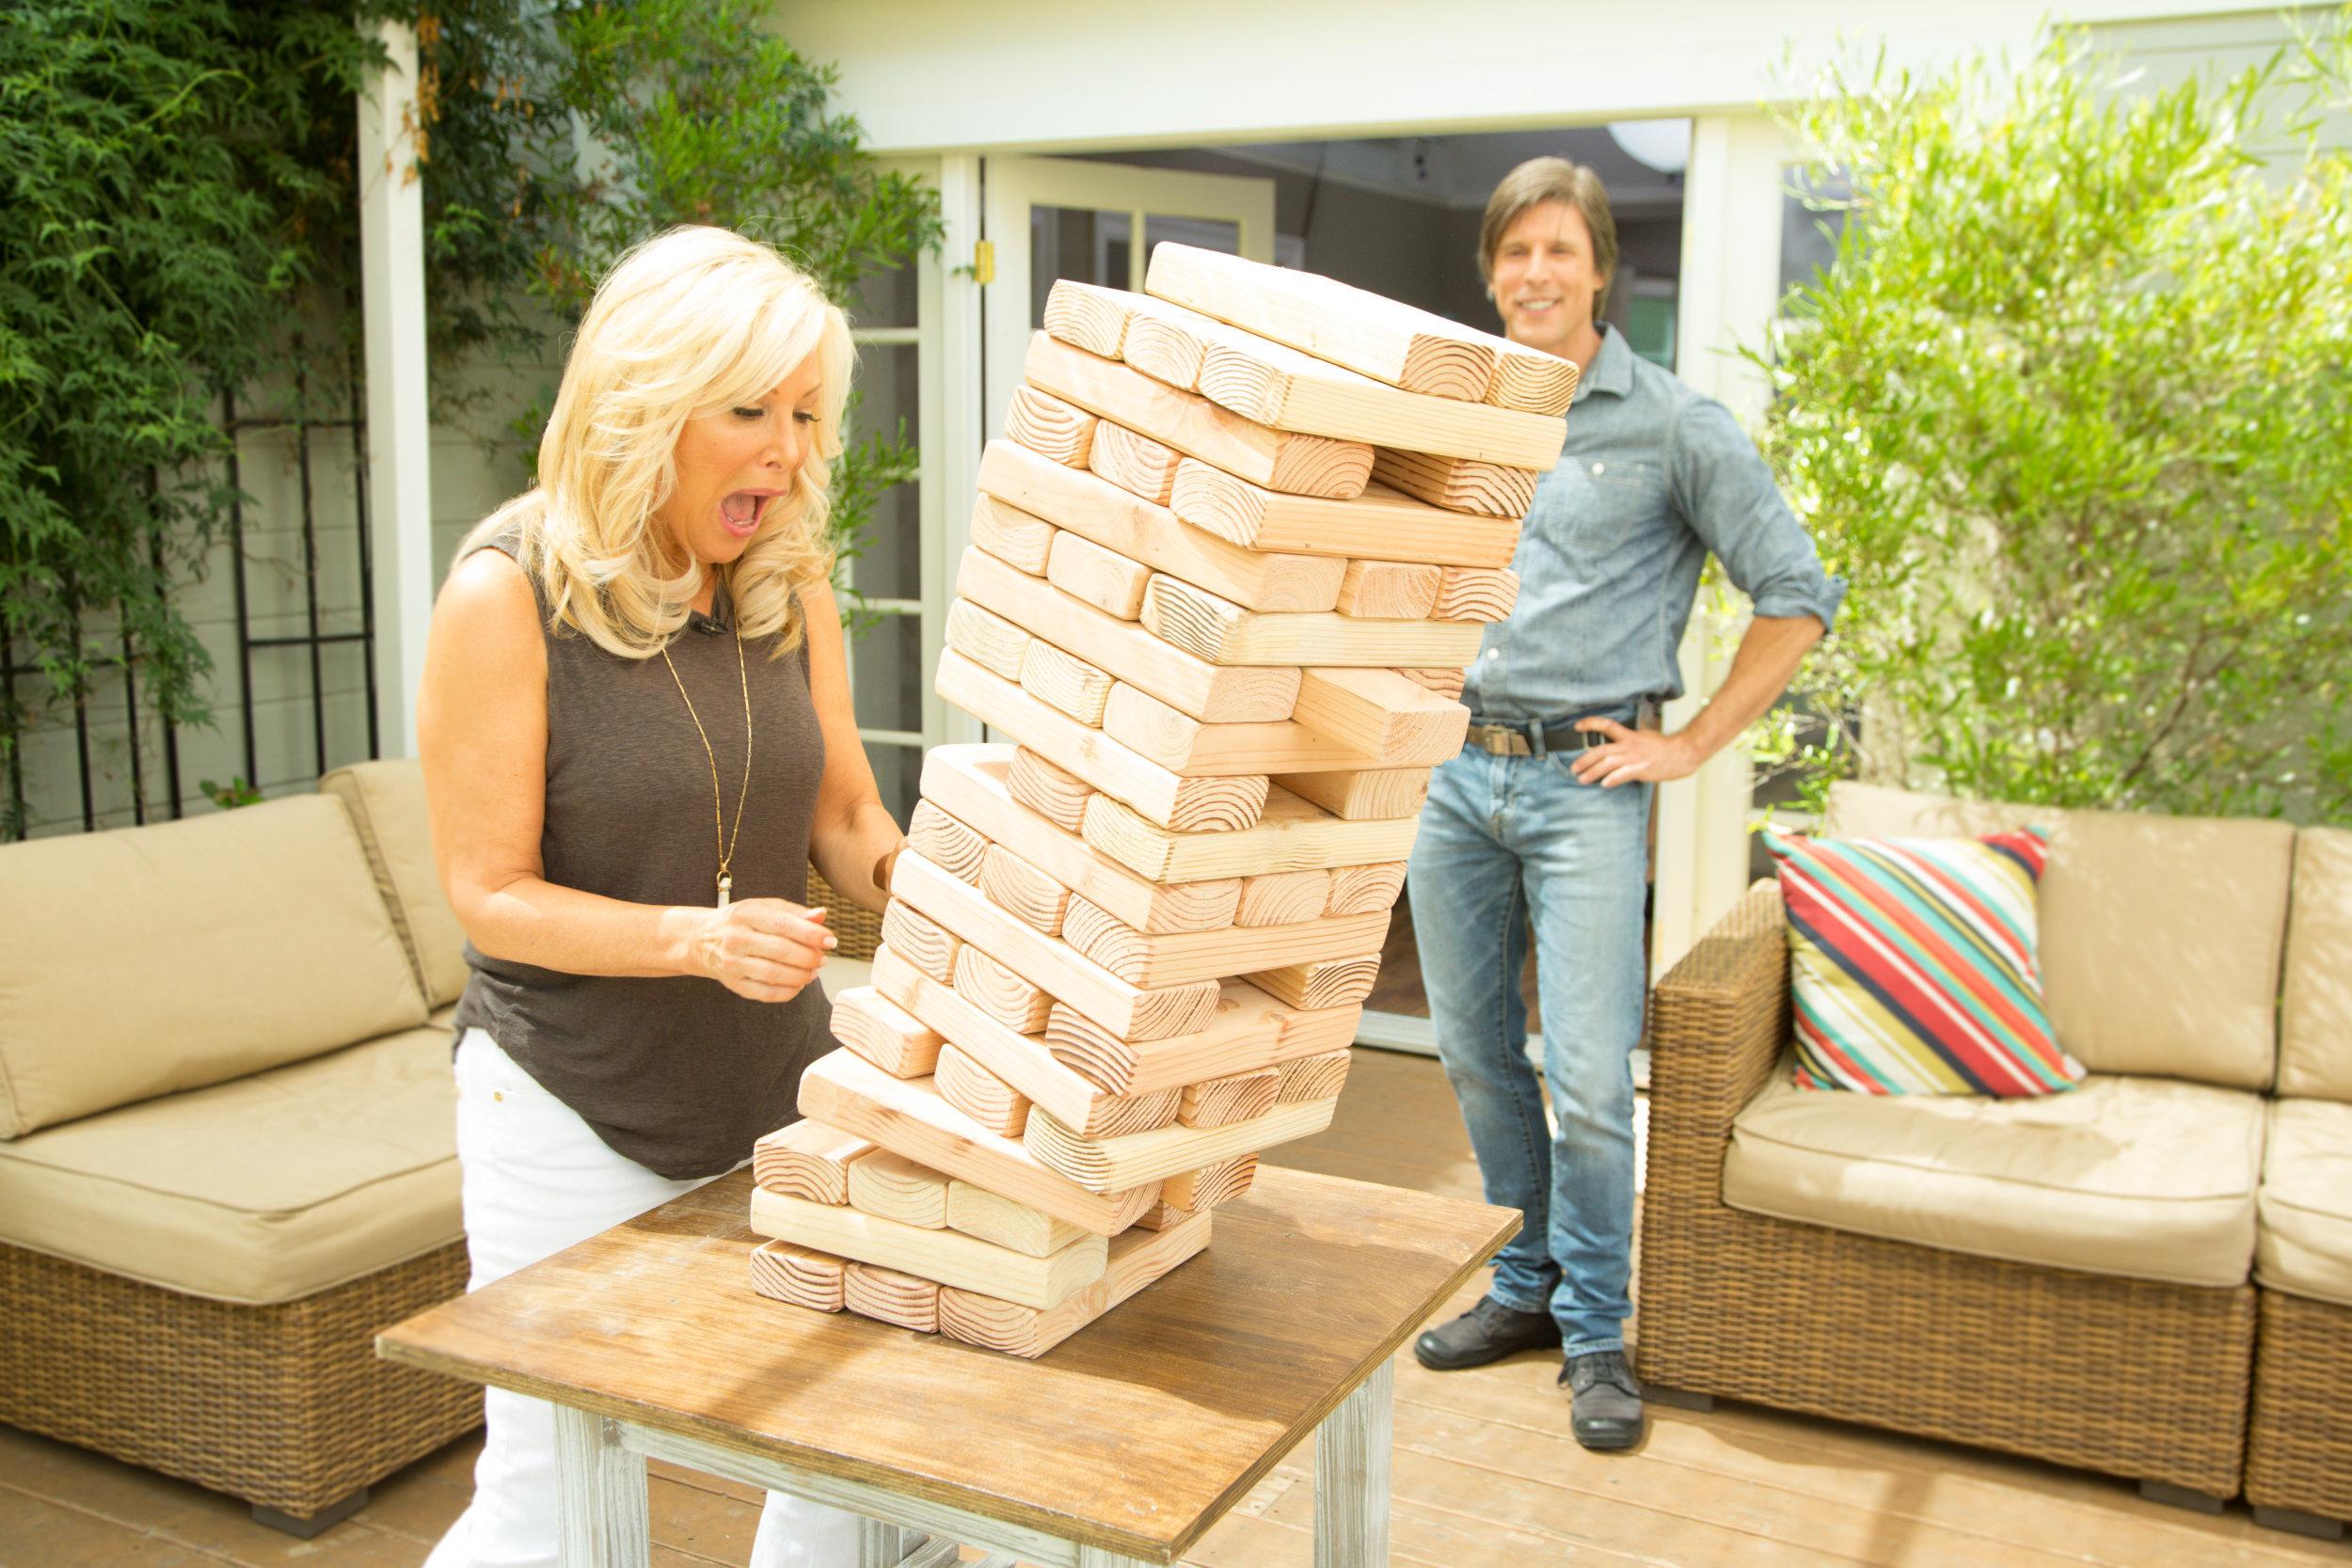 How To - DIY Giant Jenga Game   Home & Family   Hallmark ...